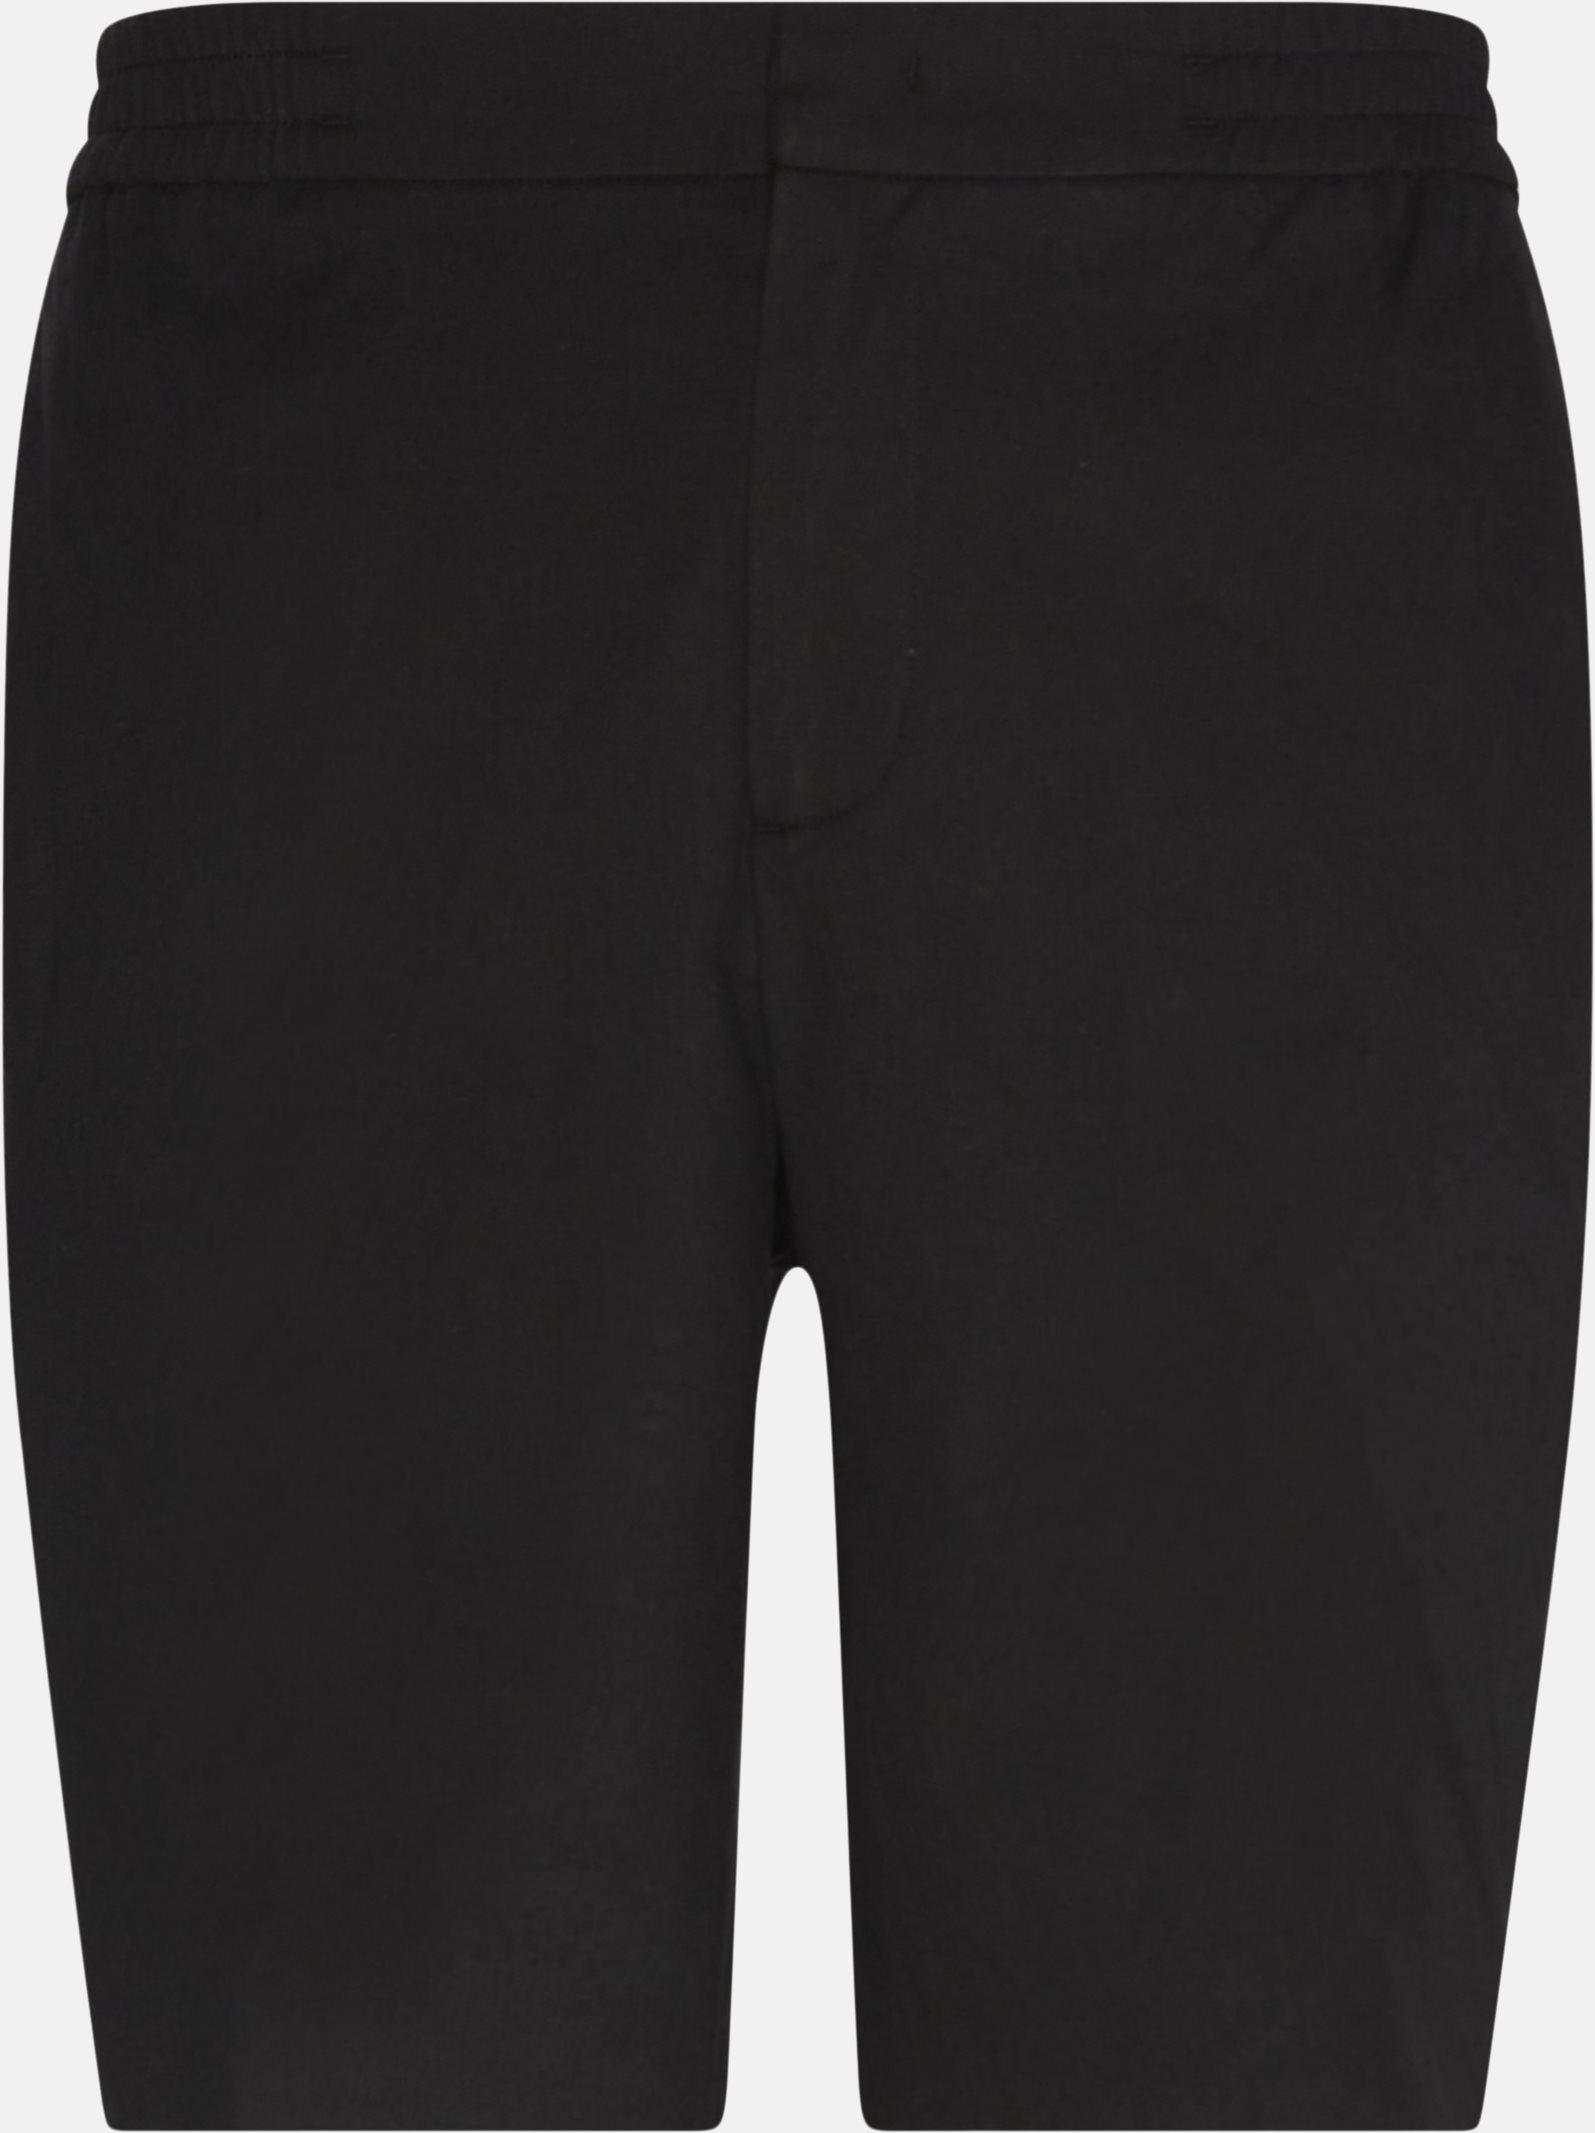 Shorts - Regular fit - Black